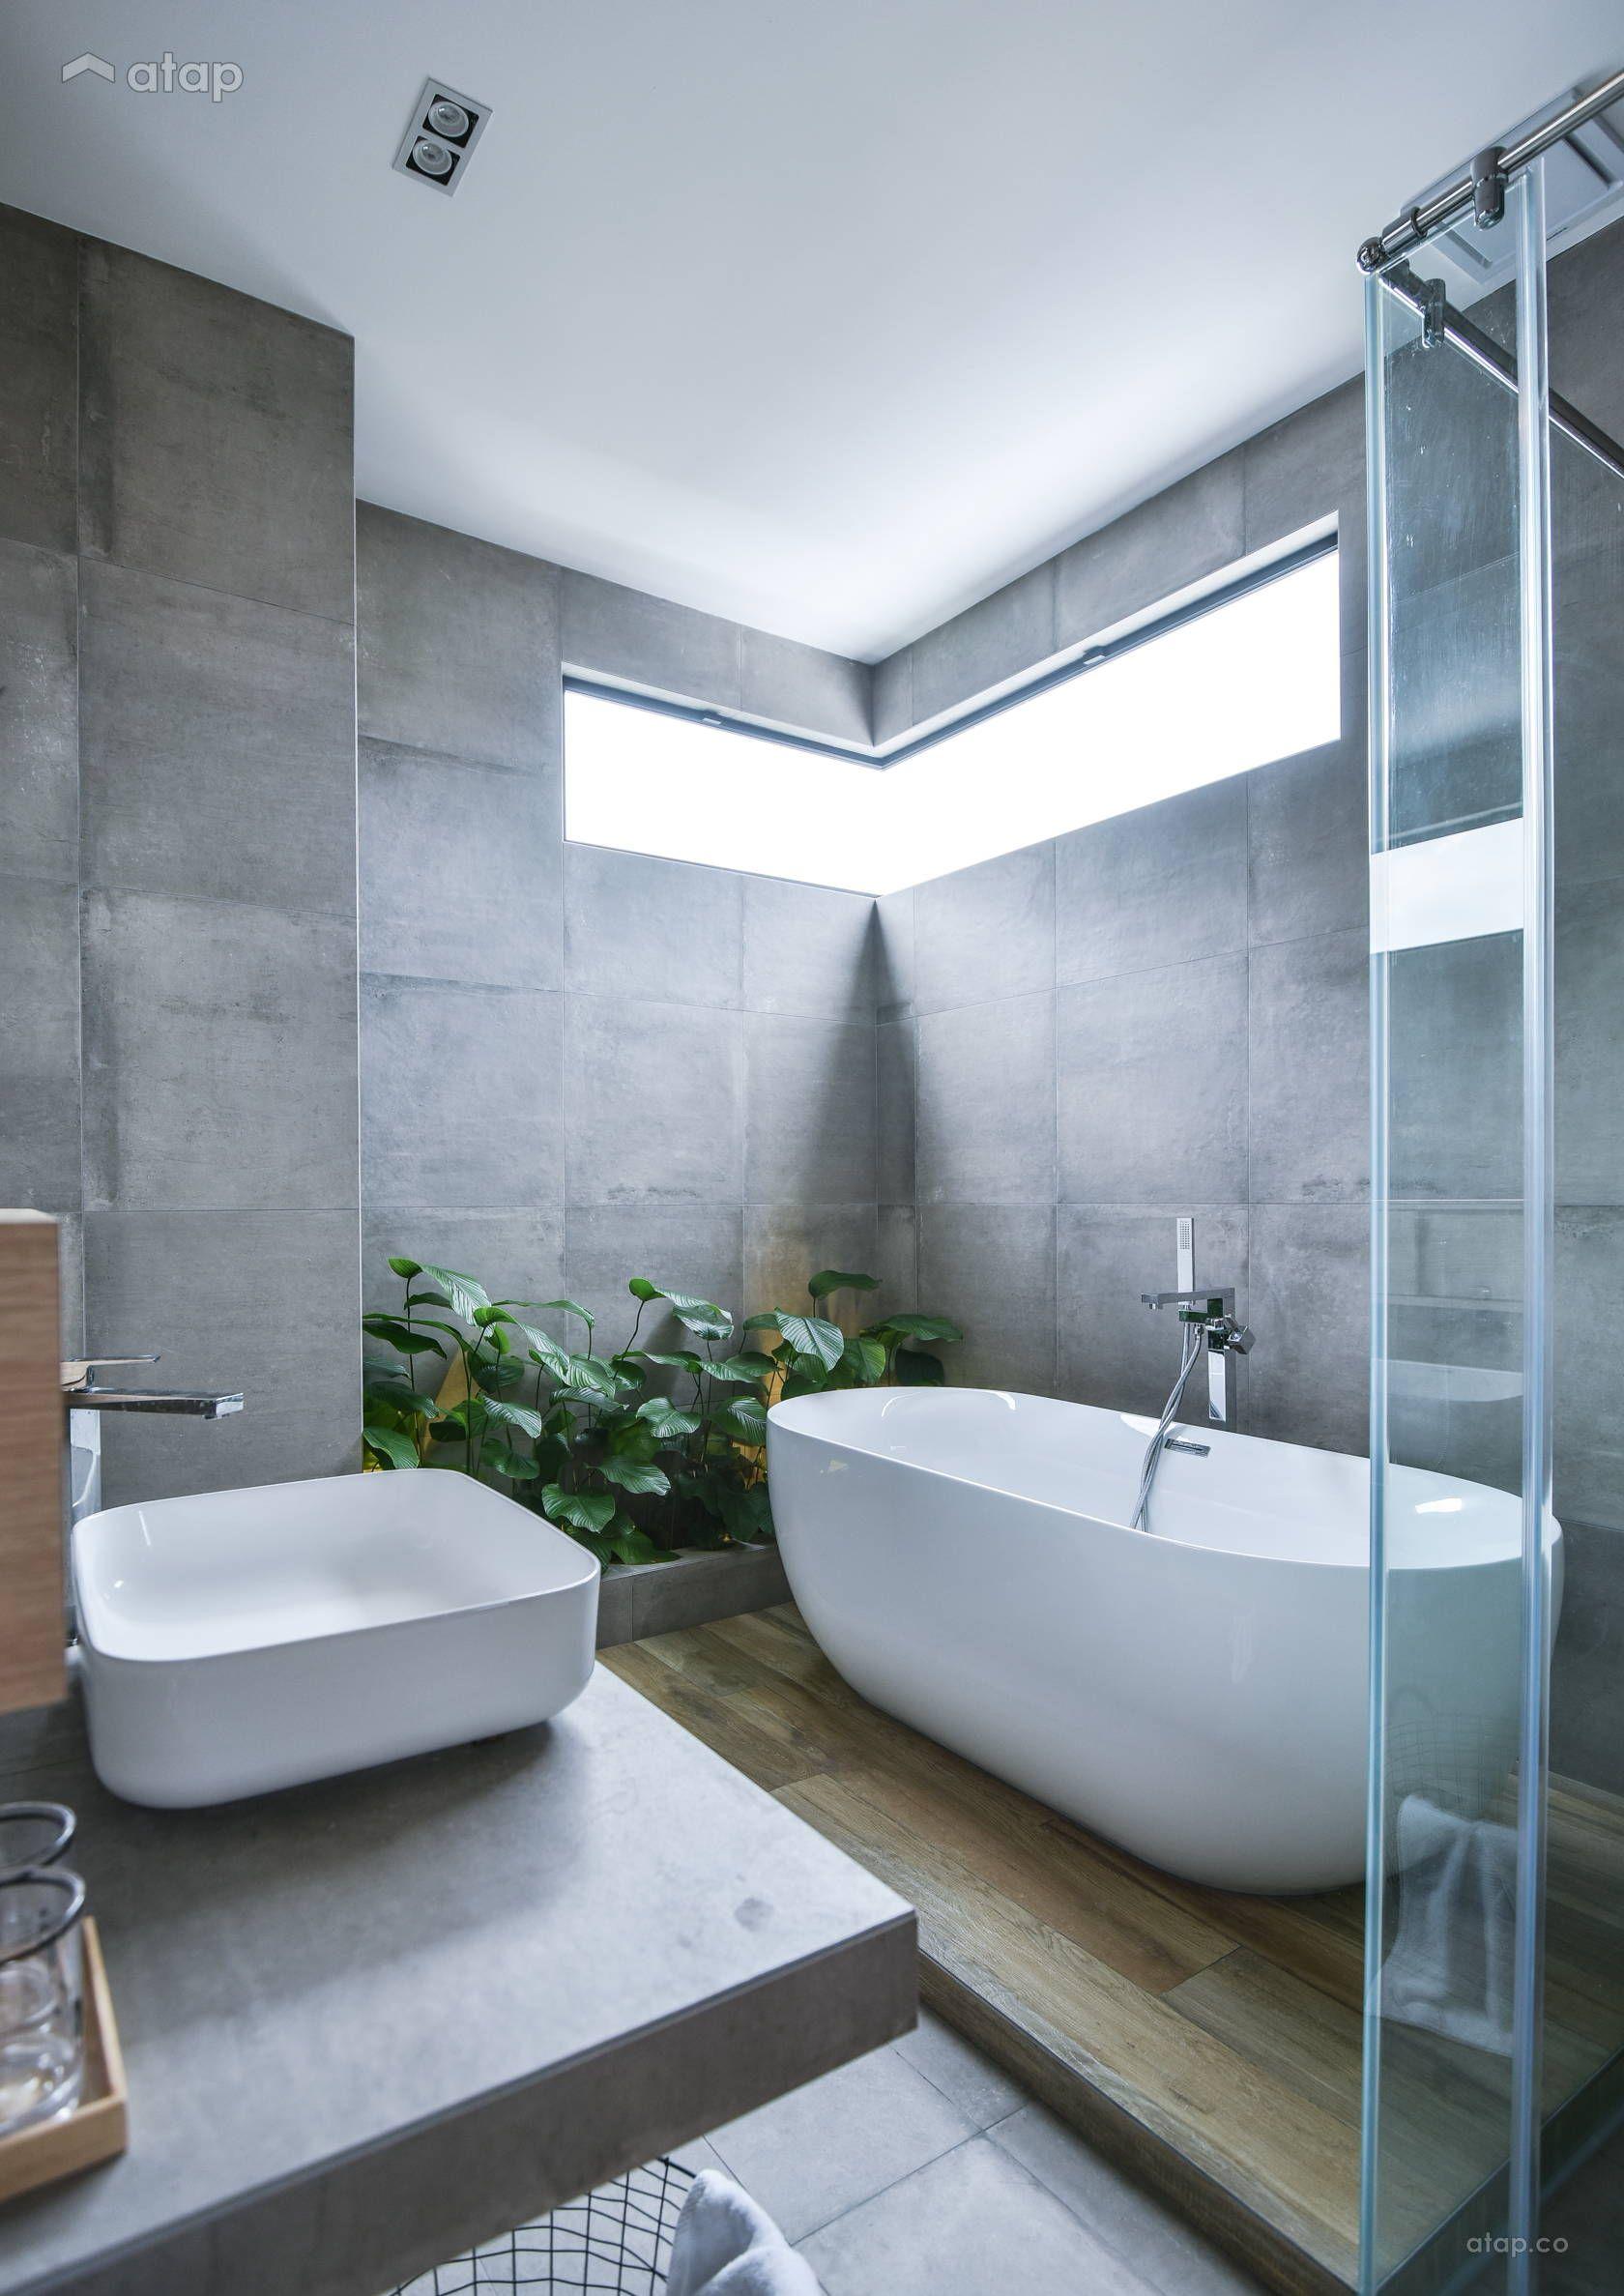 Minimalistic Scandinavian Bathroom Semi Detached Design Ideas Photos Mala In 2021 Bathroom Design Plans Minimalist Small Bathrooms Scandinavian Bathroom Design Ideas